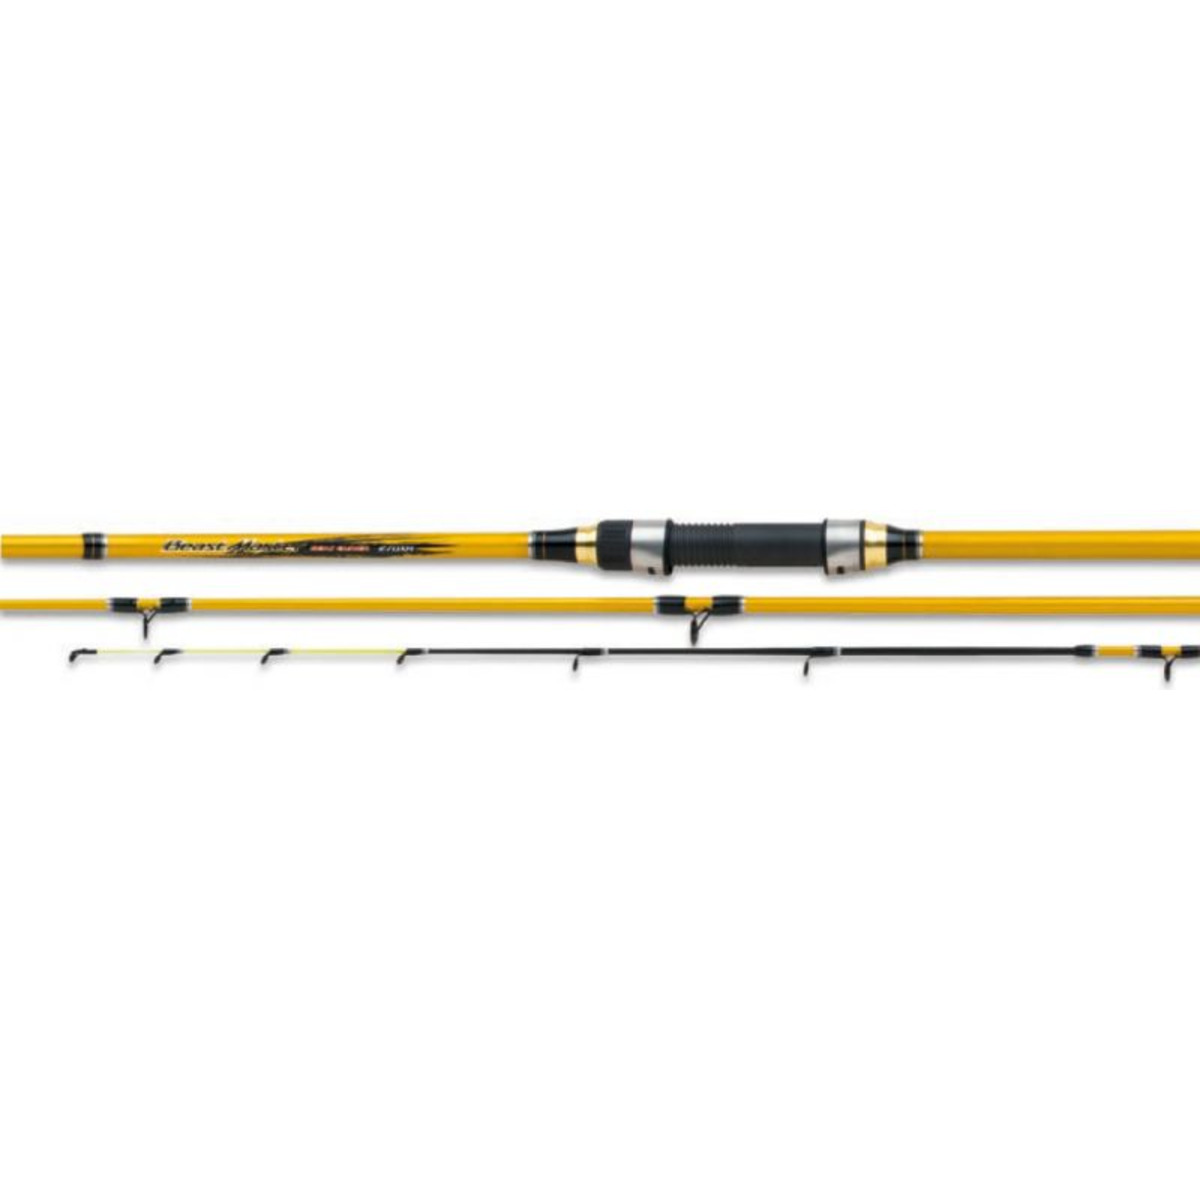 Shimano Beastmaster Boat Quiver - 3.00 m - 250 g